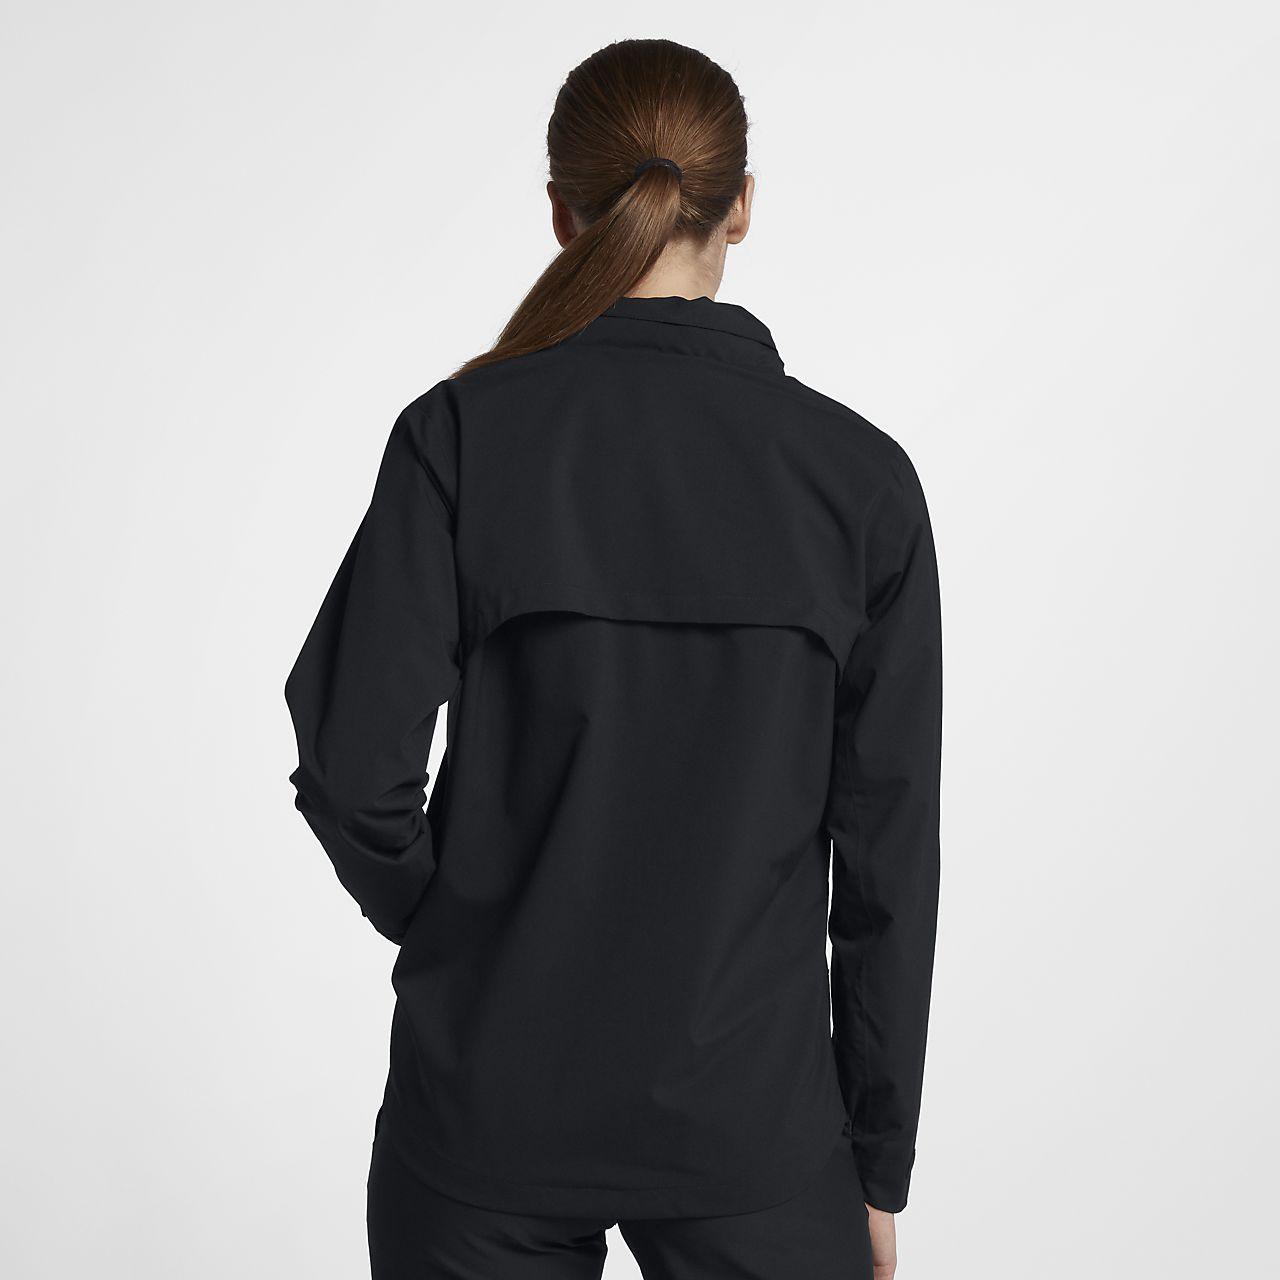 9fe968bbda2f Nike HyperShield Women s Full-Zip Golf Jacket. Nike.com